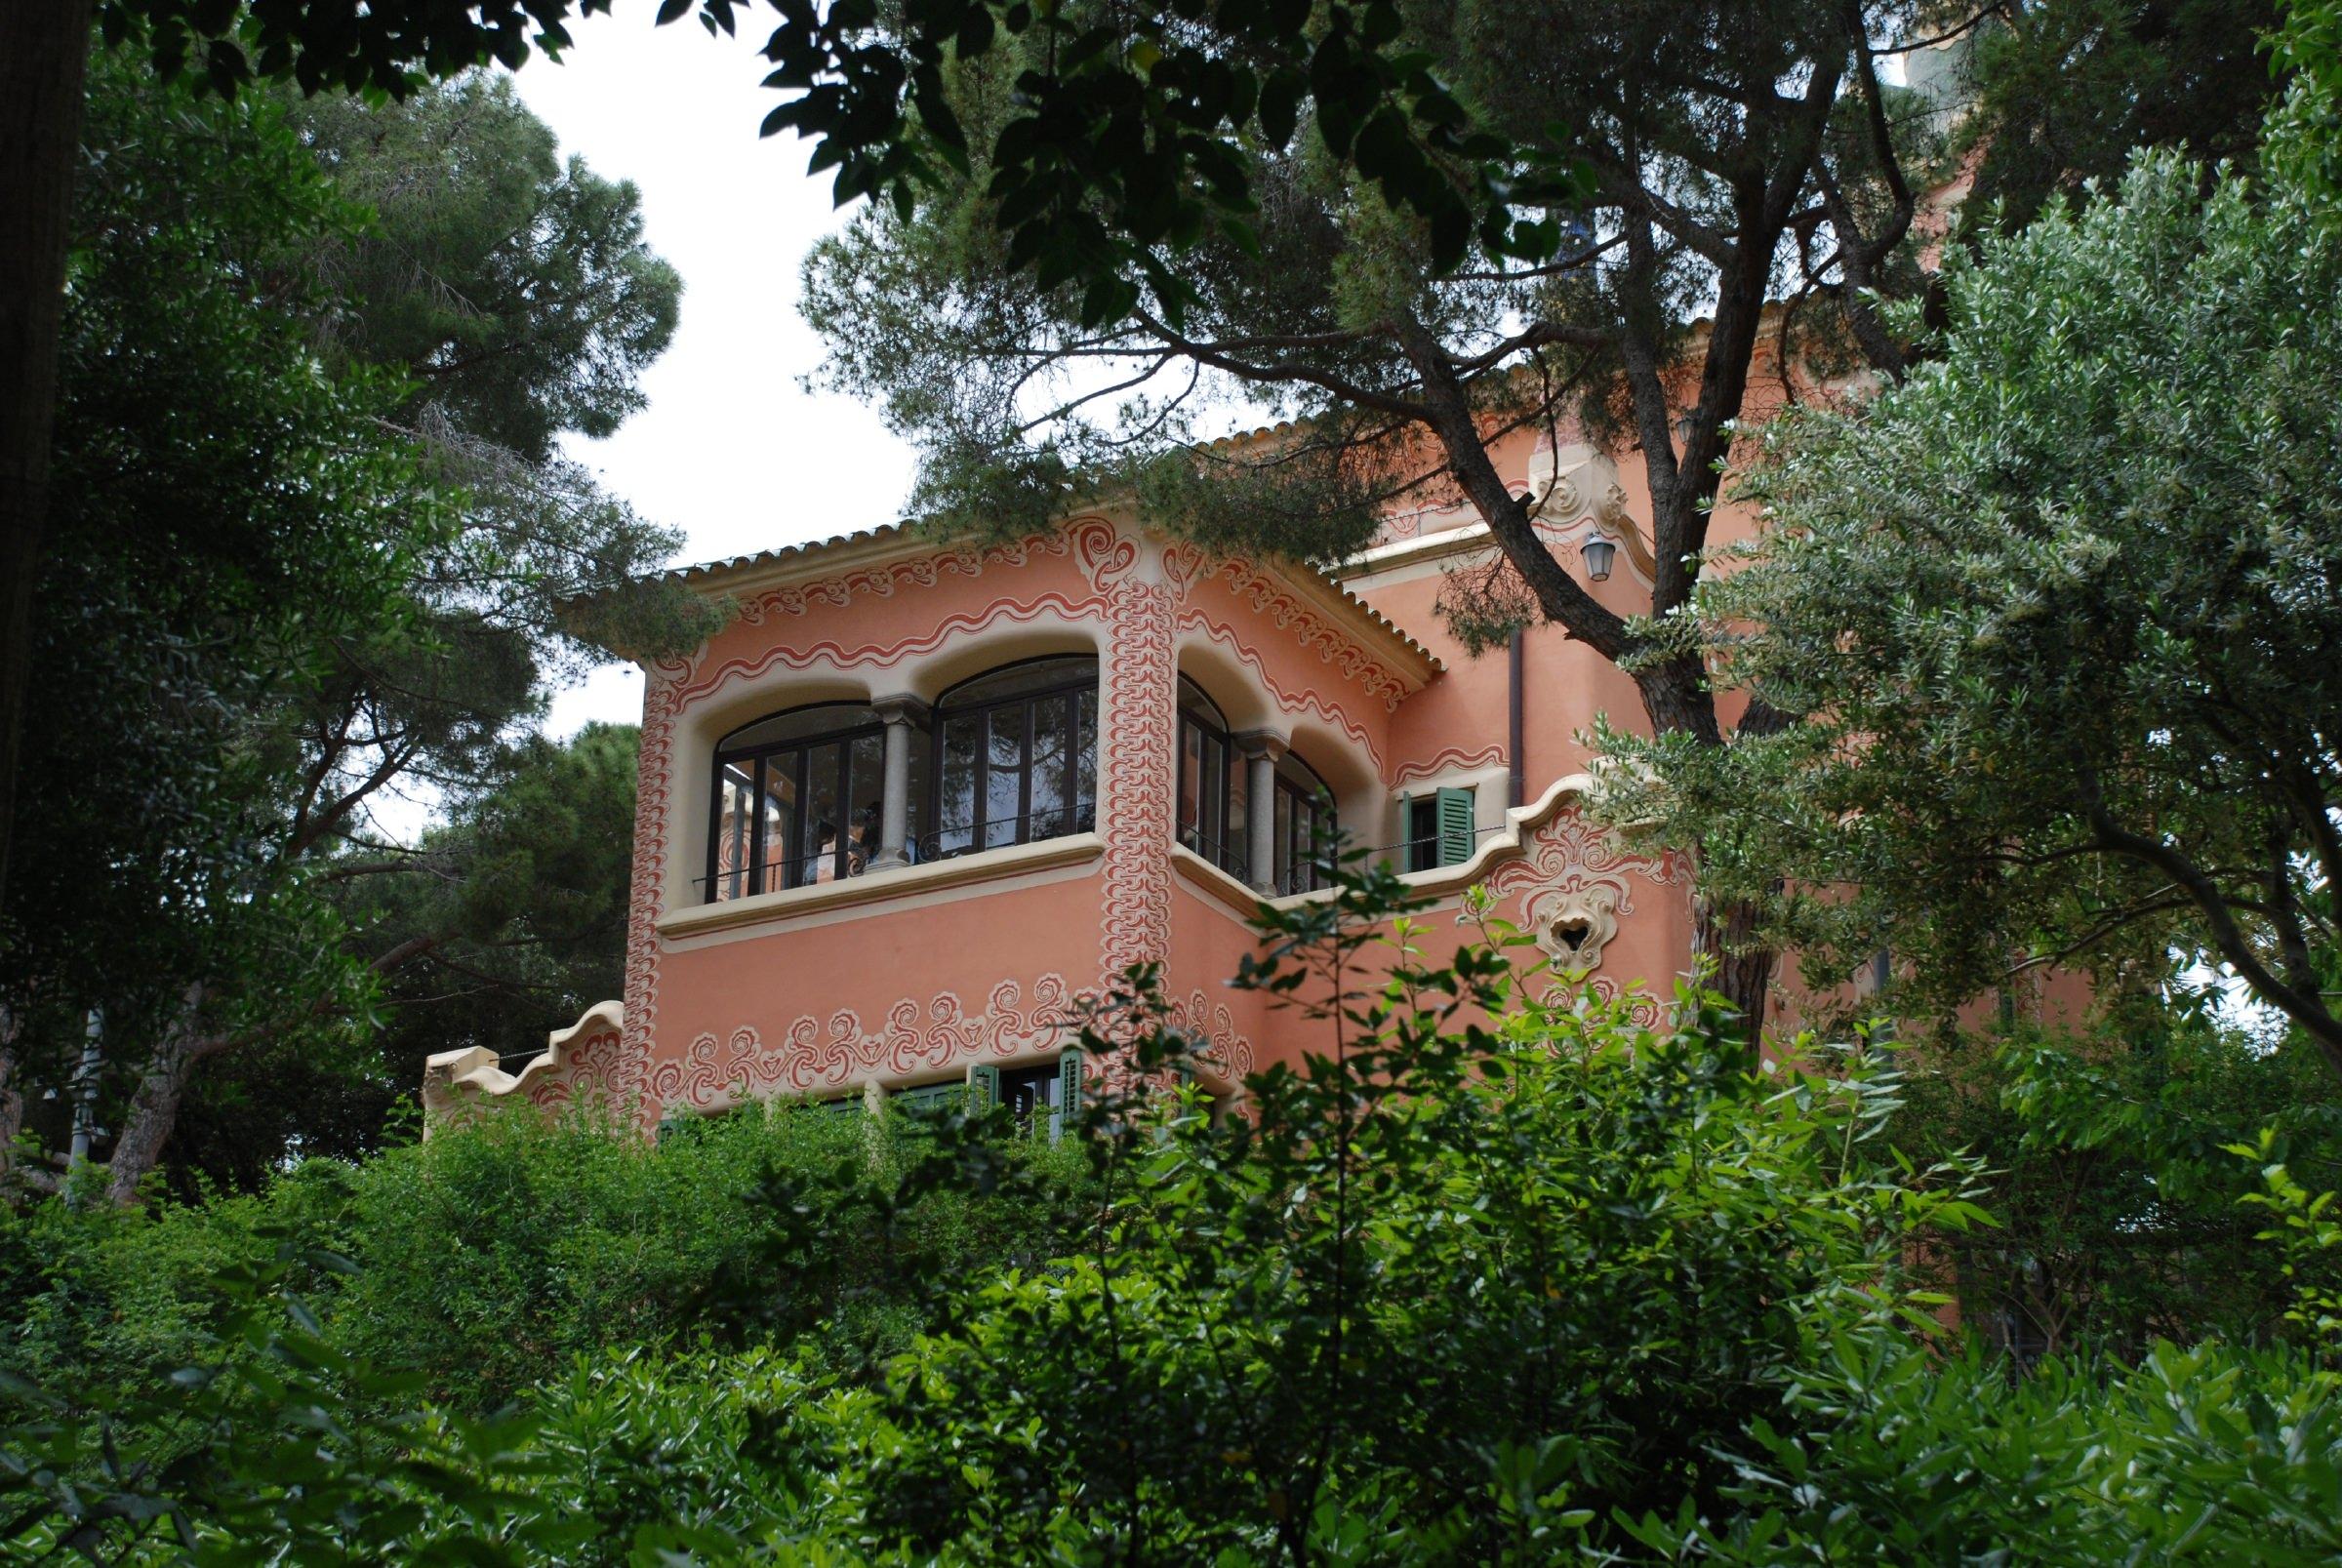 Casa Museo Gaudi.Casa Museu Gaudi Barcelona Spain Attractions Lonely Planet